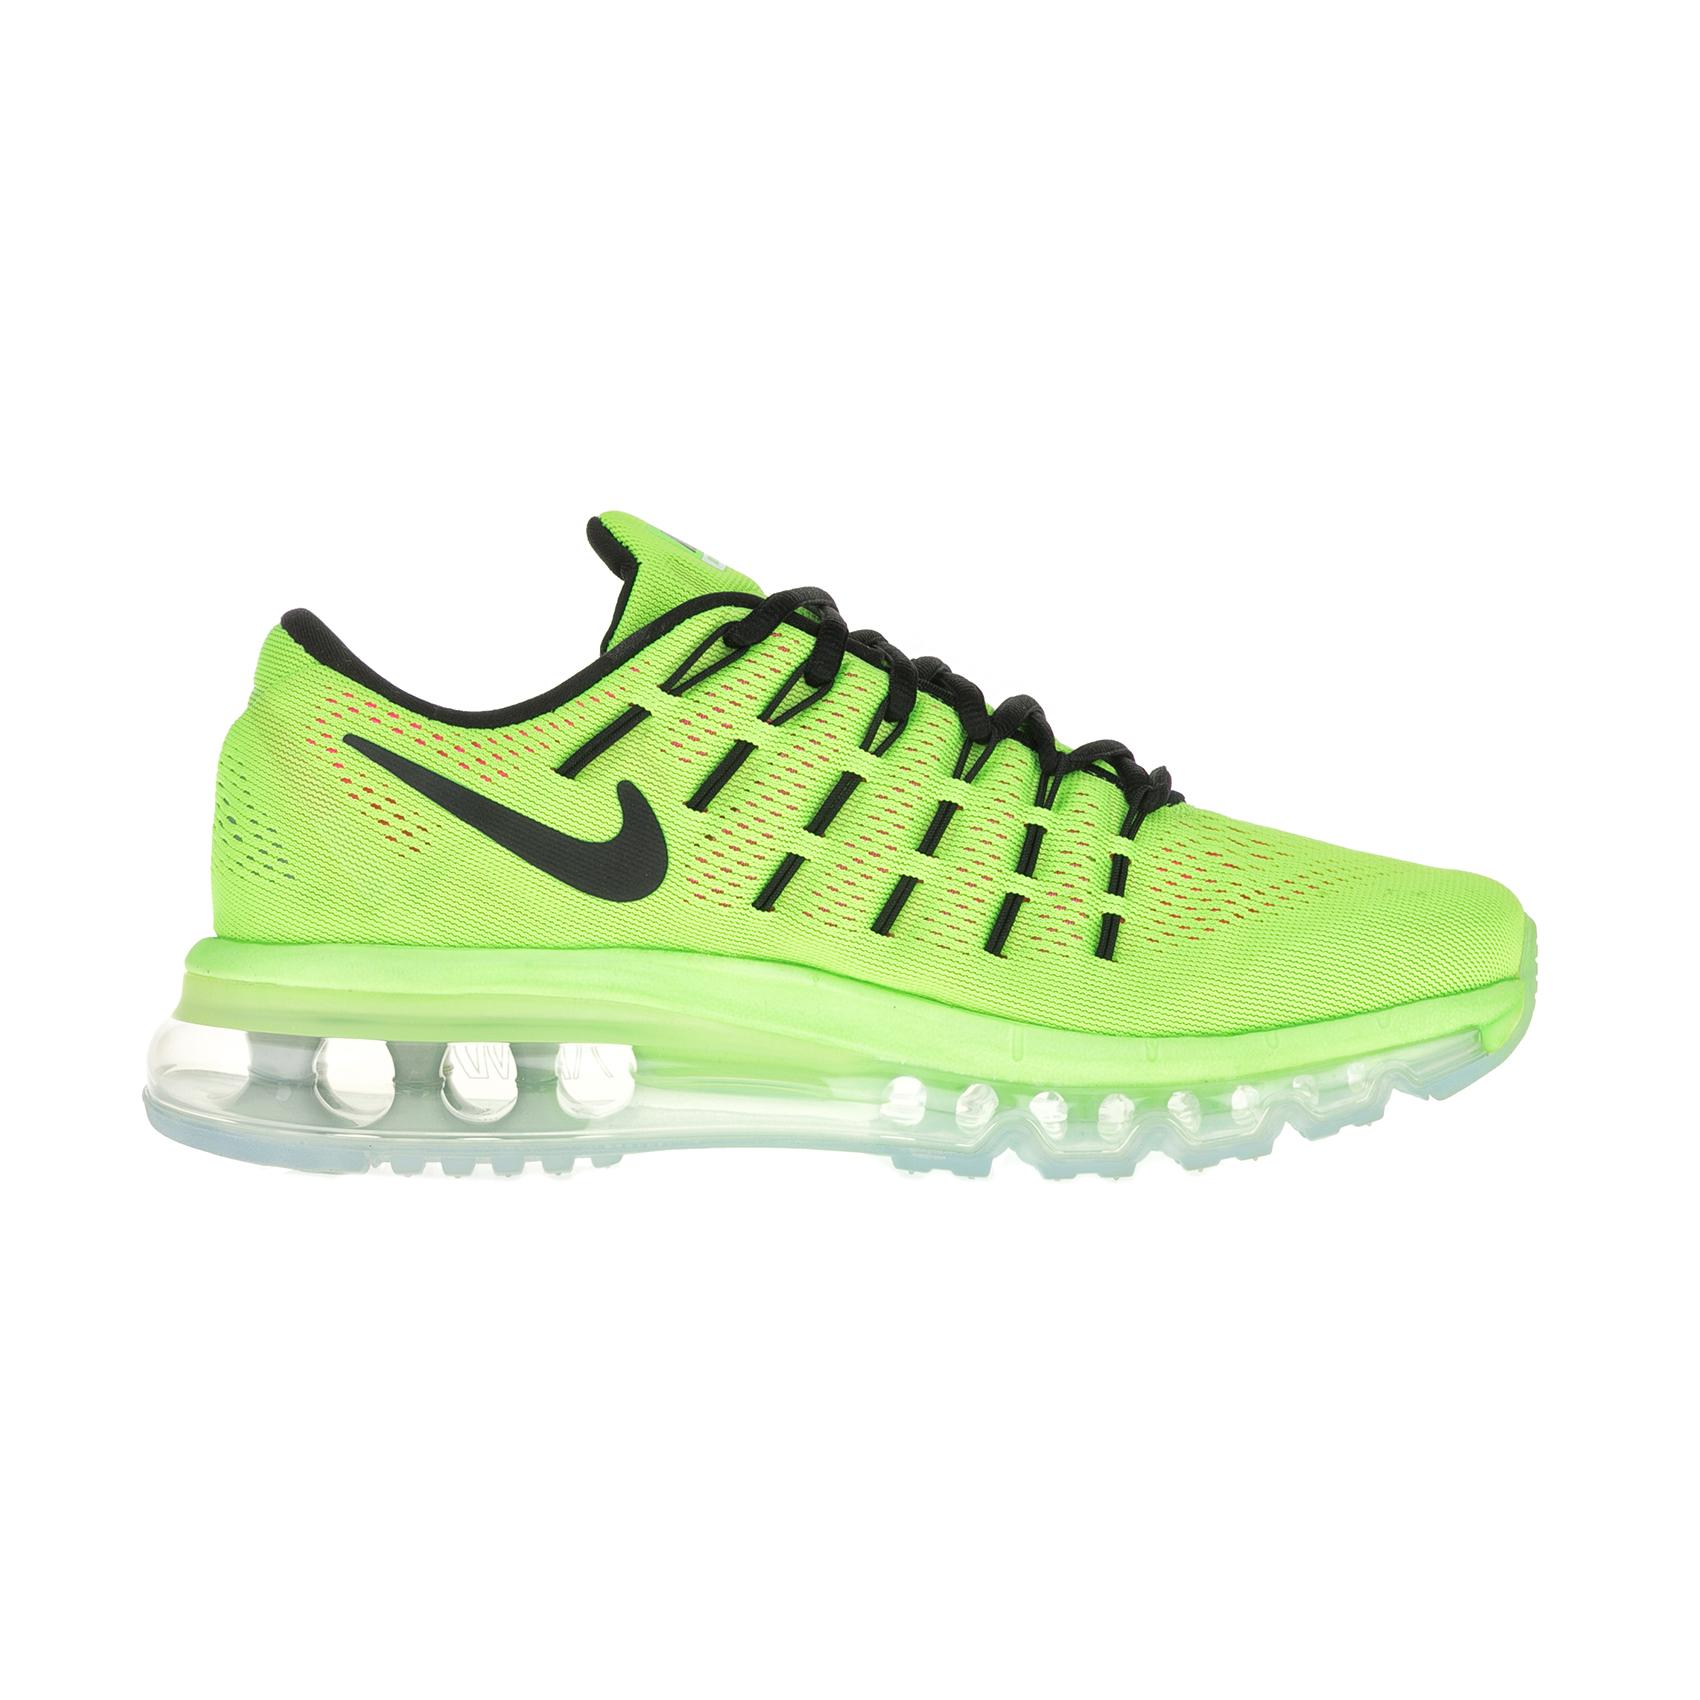 NIKE – Ανδρικά αθλητικά παπούτσια Nike AIR MAX 2016 κίτρινα